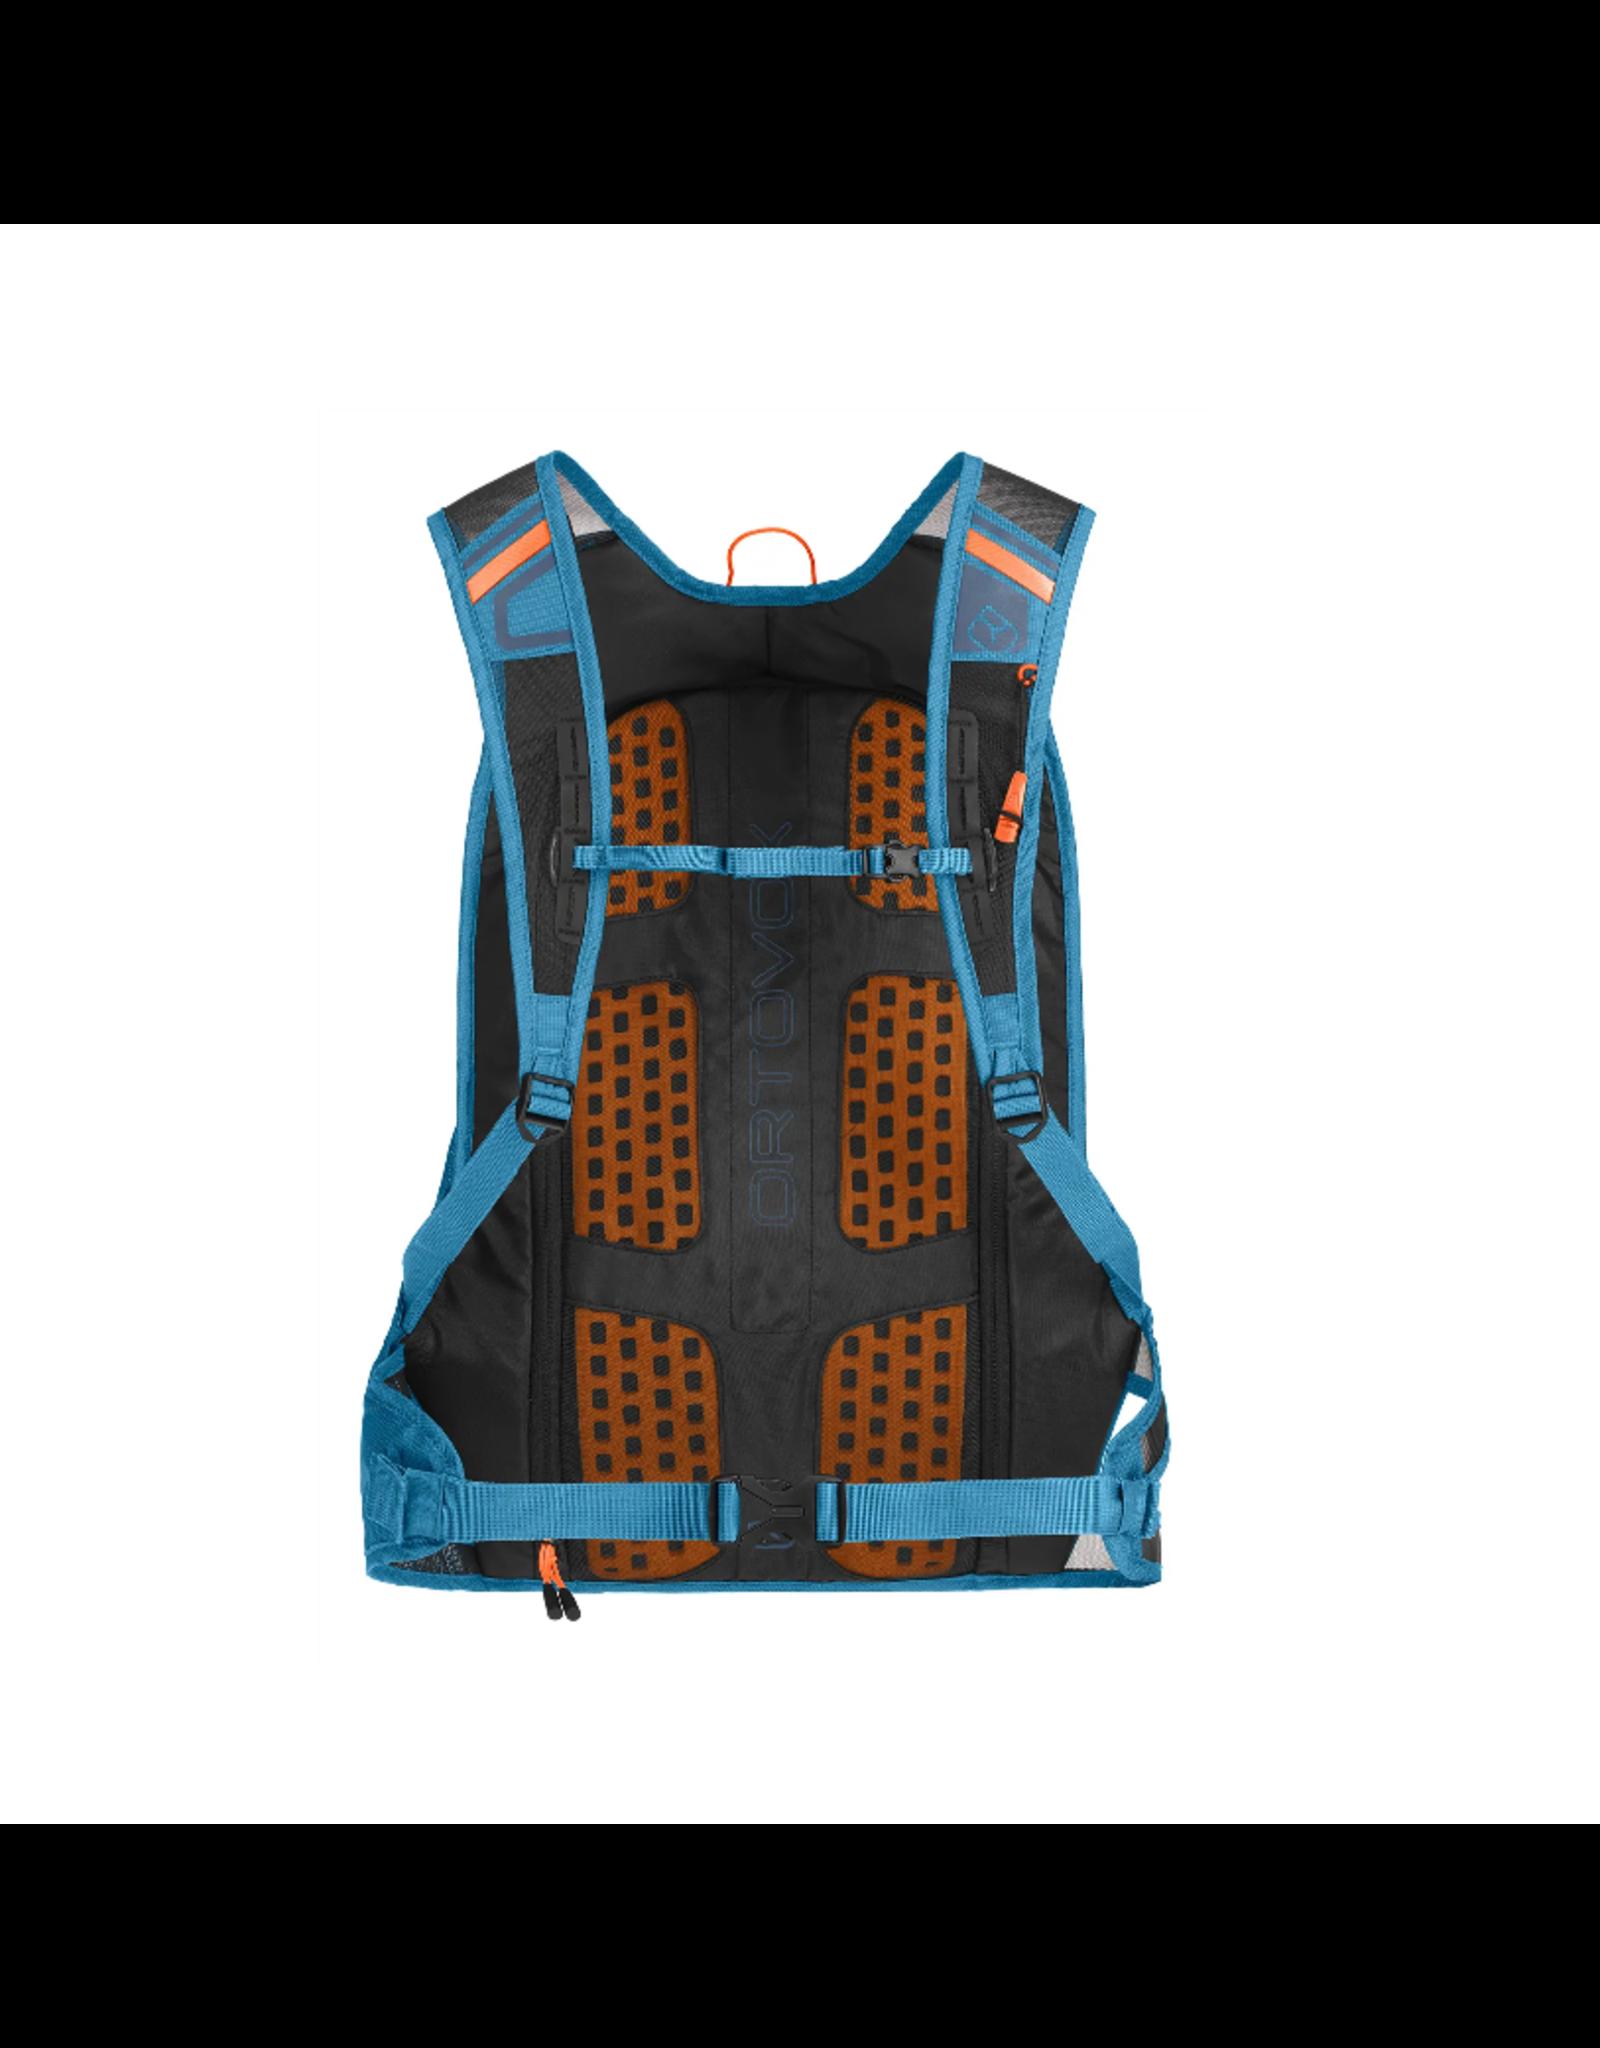 Ortovox Trace 20 Packs